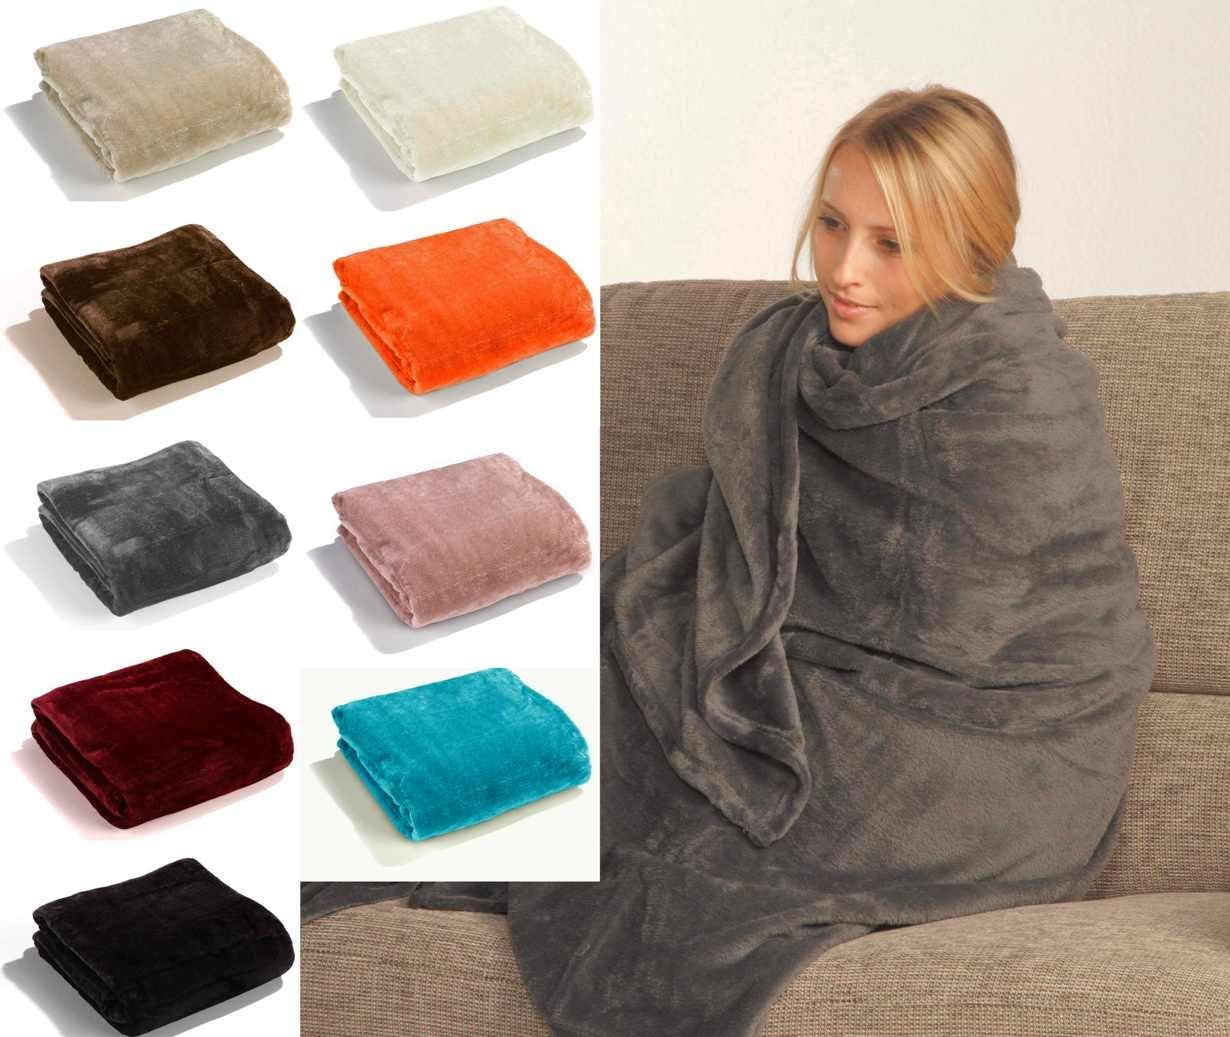 sofa decke latest jemidi xxl fleecedecke fleece wohndecke. Black Bedroom Furniture Sets. Home Design Ideas